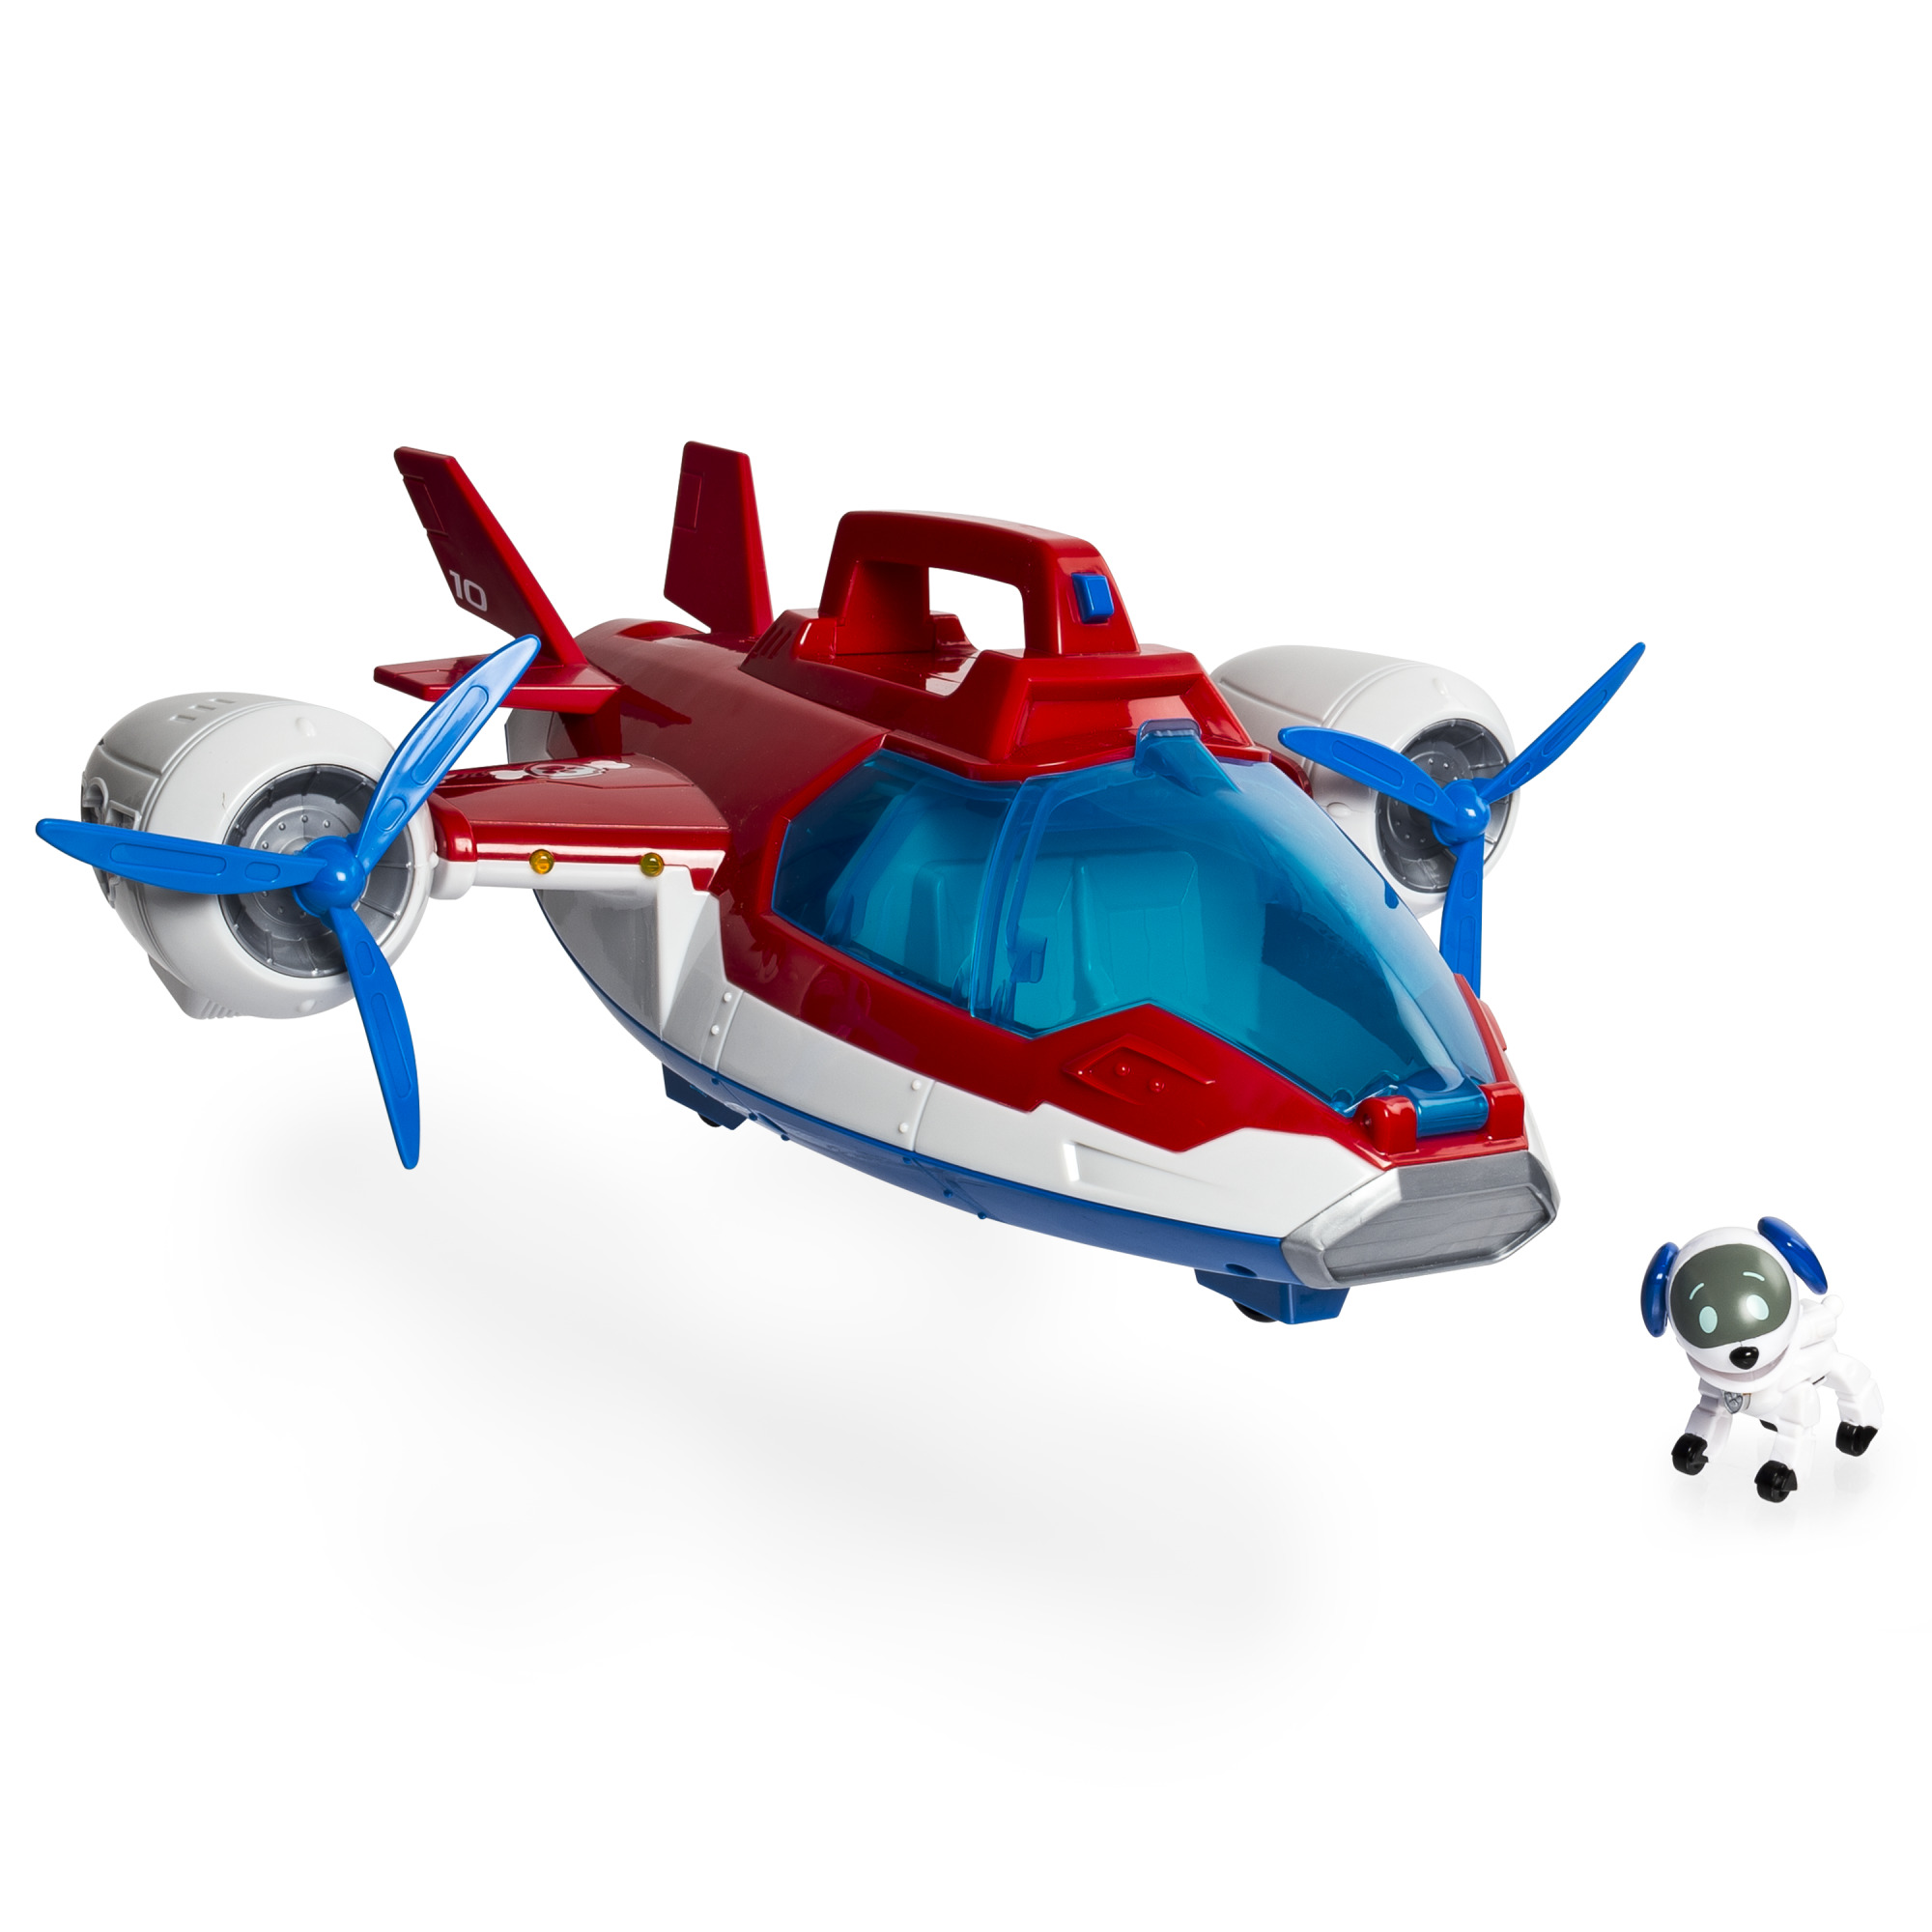 778988133224_20070790_Air Patroller_GBL_Product_1